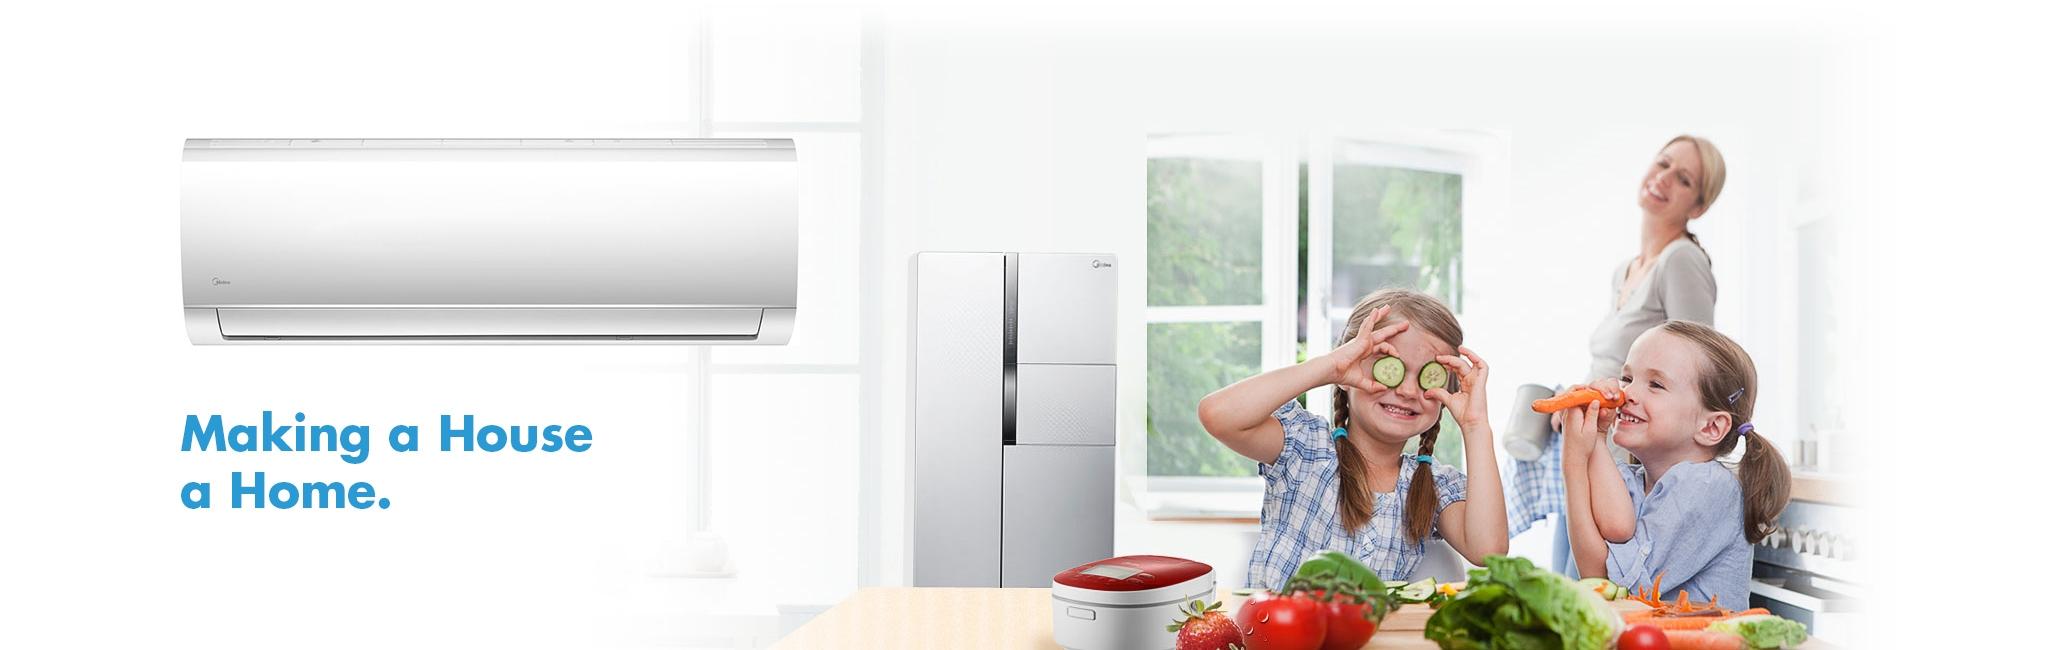 Midea MSMABU-12HRDN1 Blanc inverter air conditioner